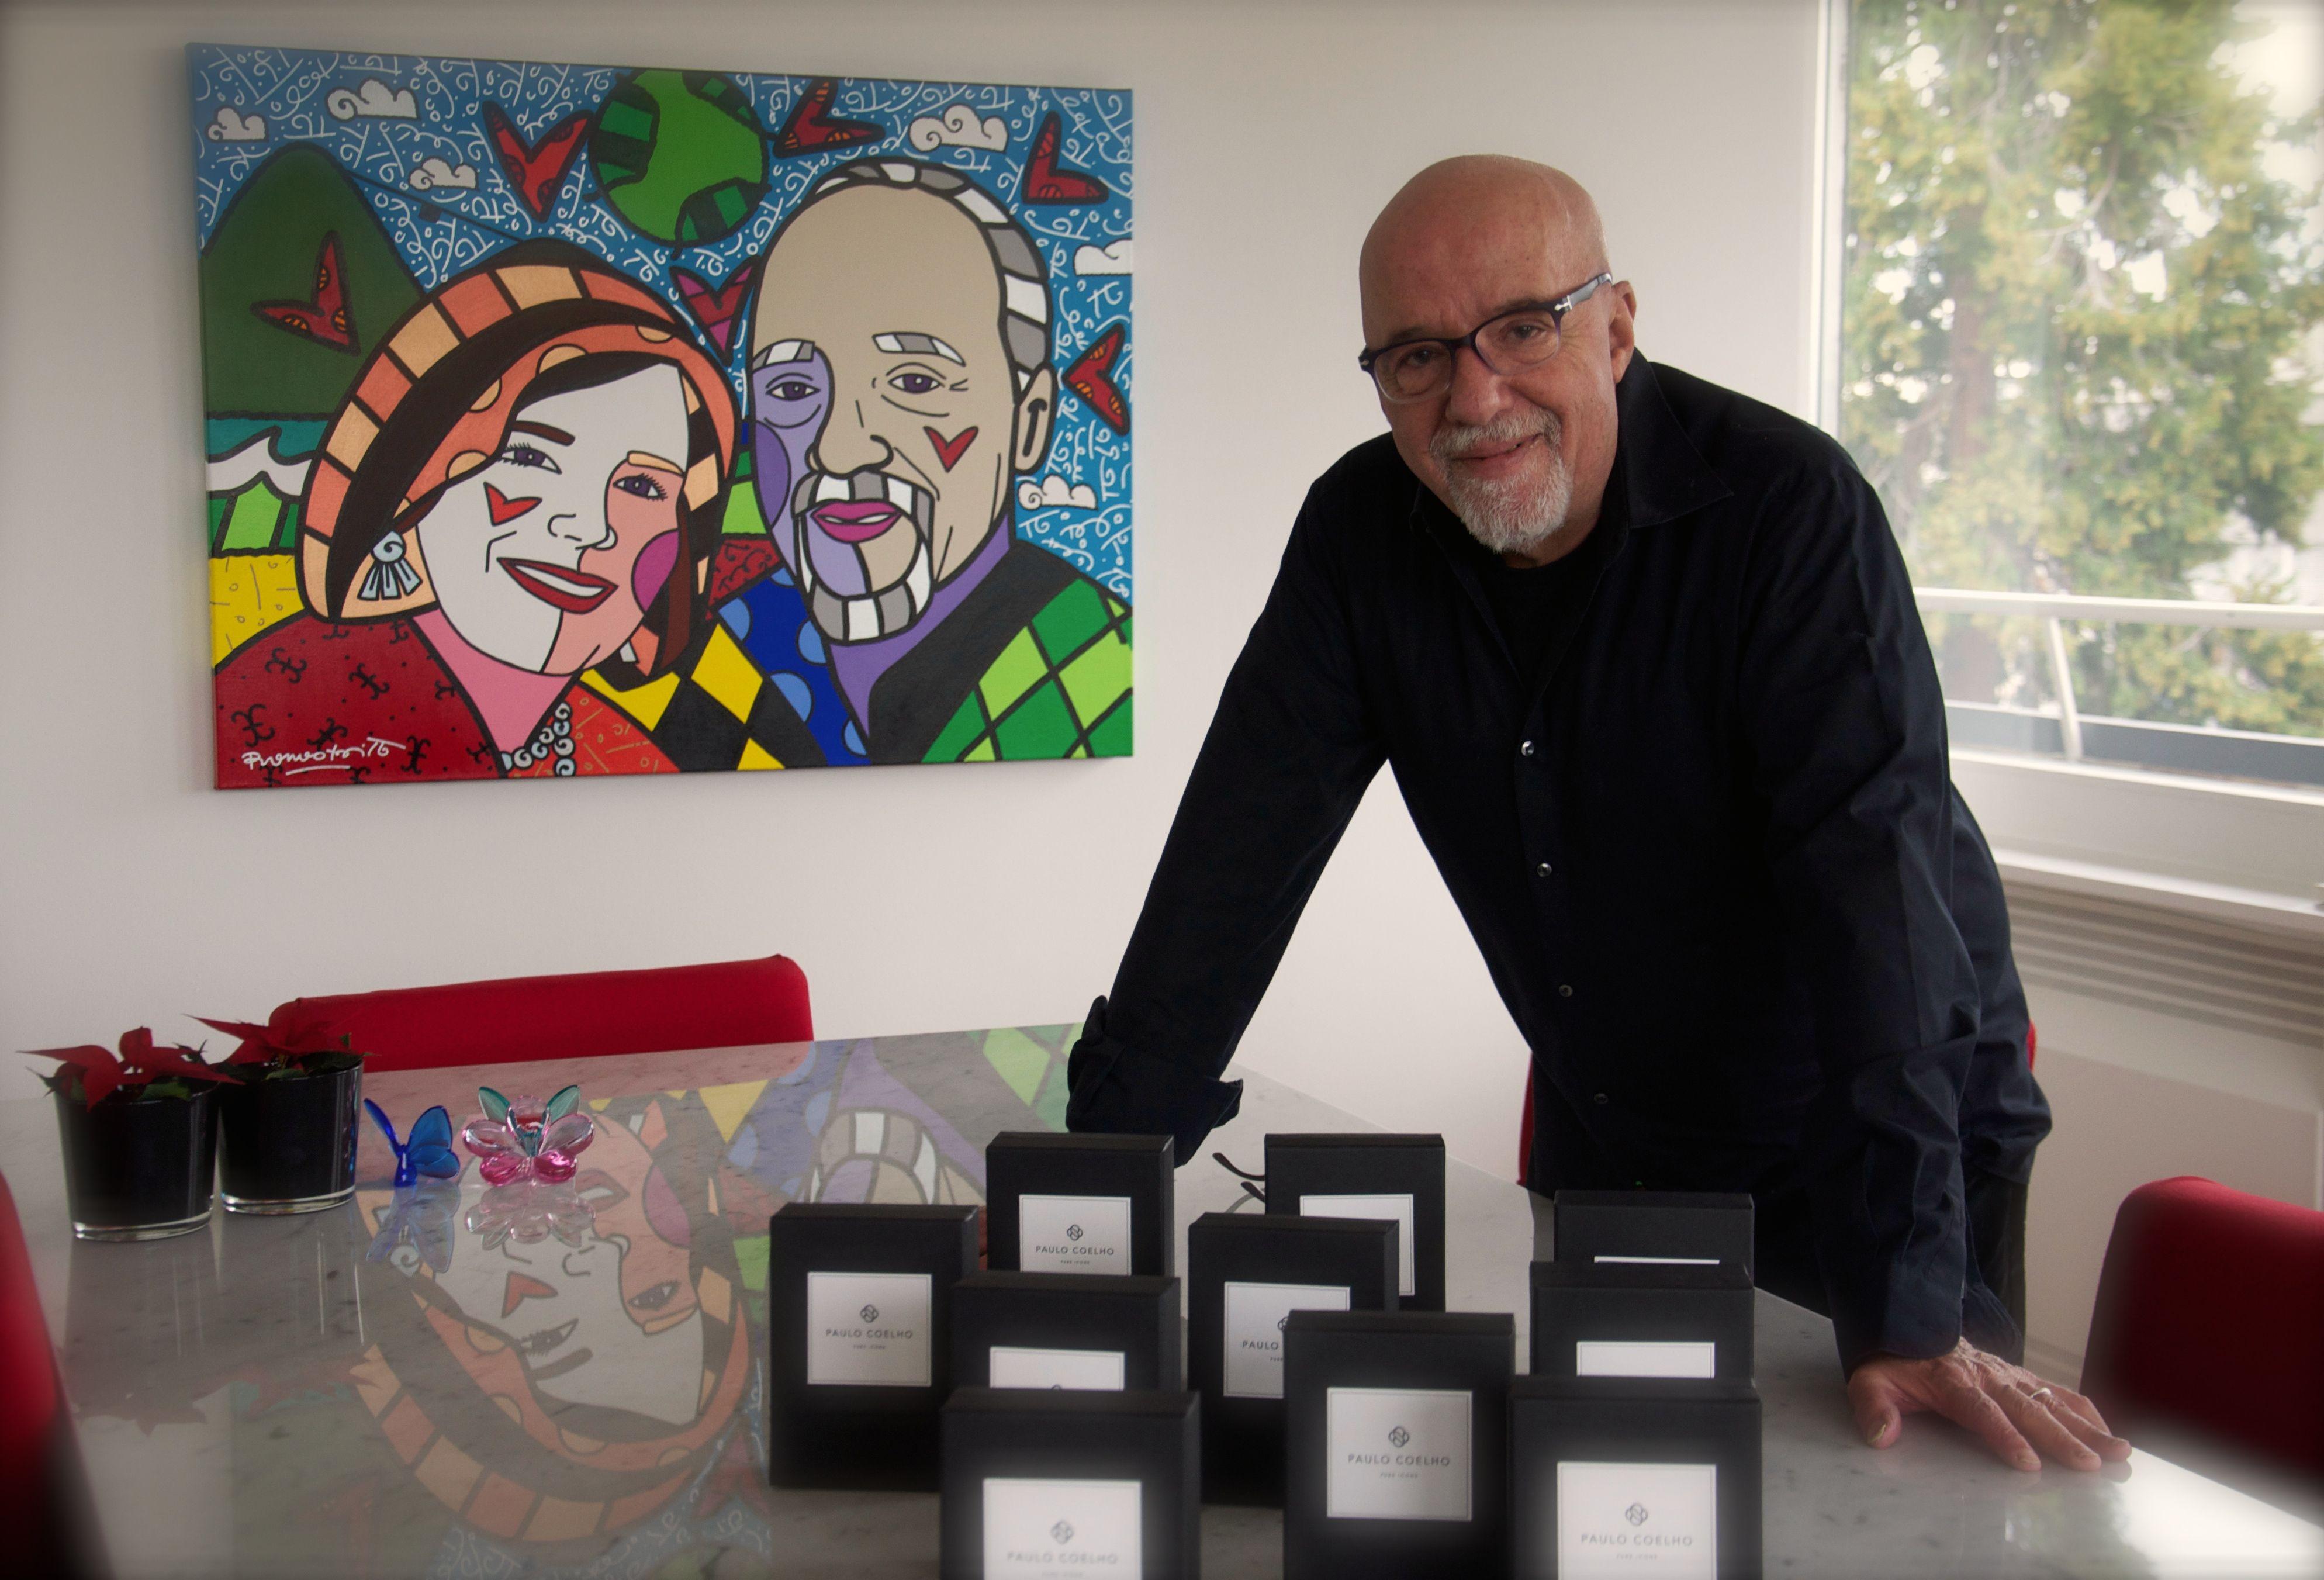 Behind the scenes with Paulo Coelho